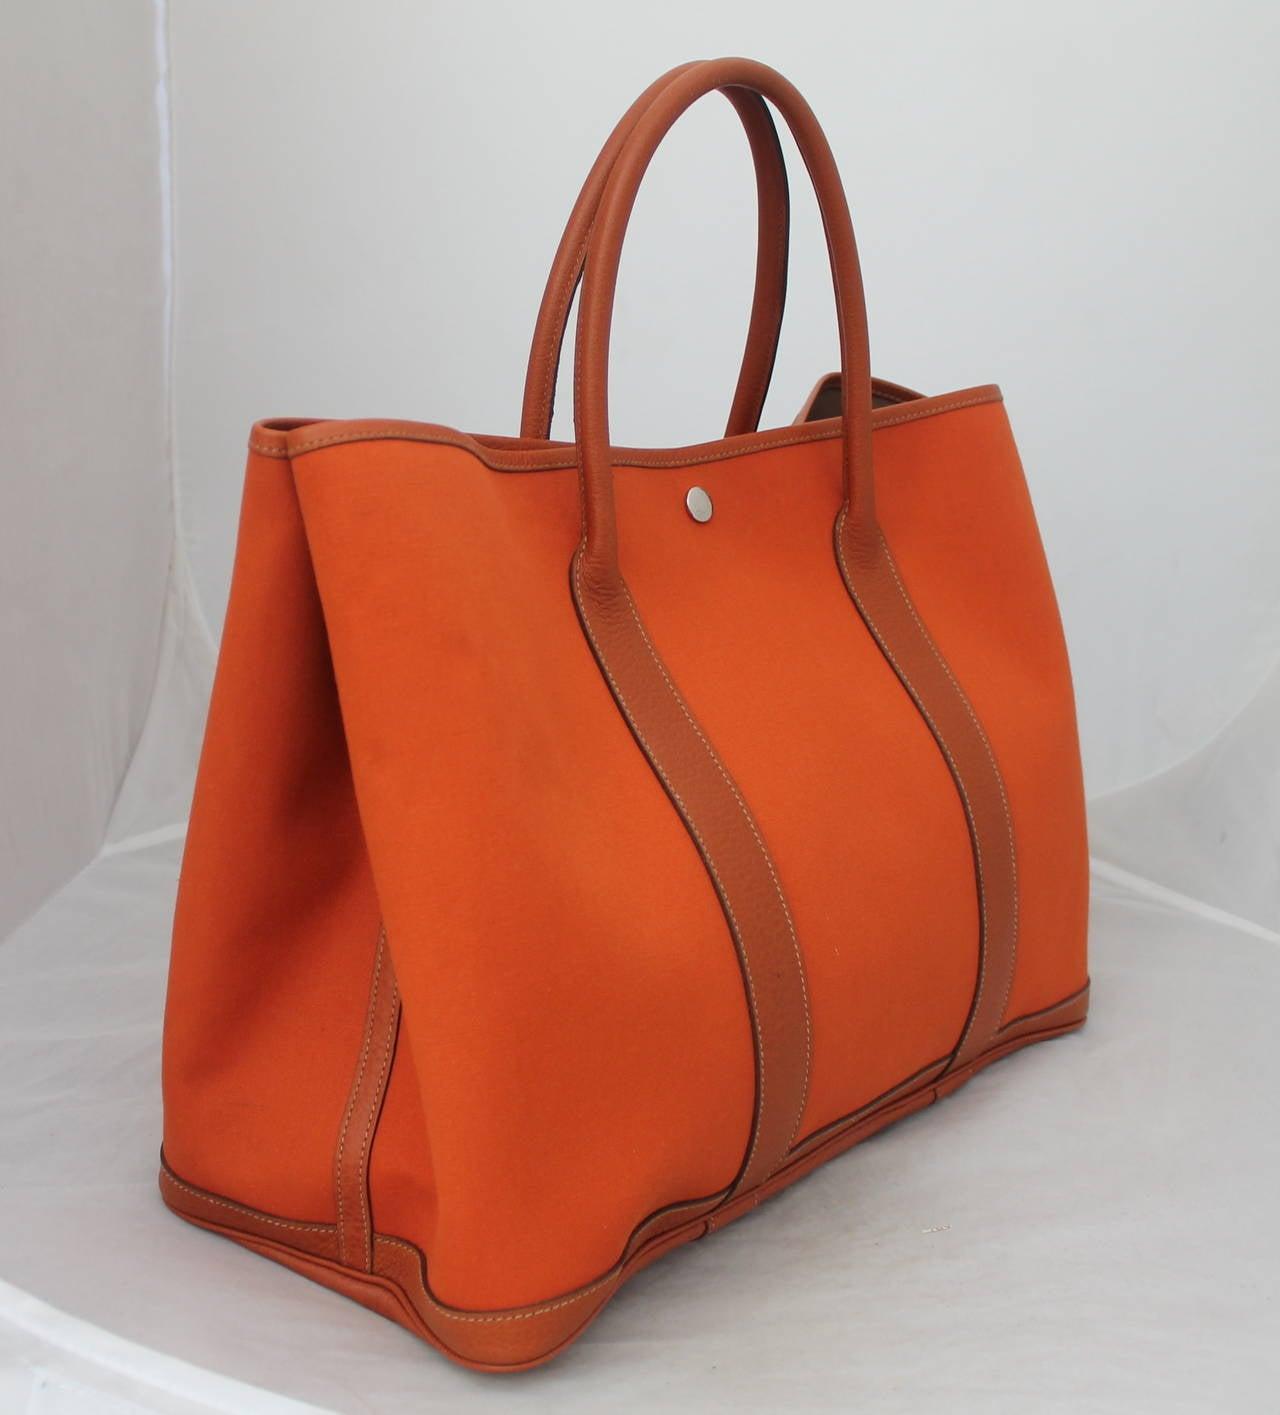 hermes birkin replica cheap - Hermes Burnt Orange Garden Party GM Handbag Retail circa 2006 For ...